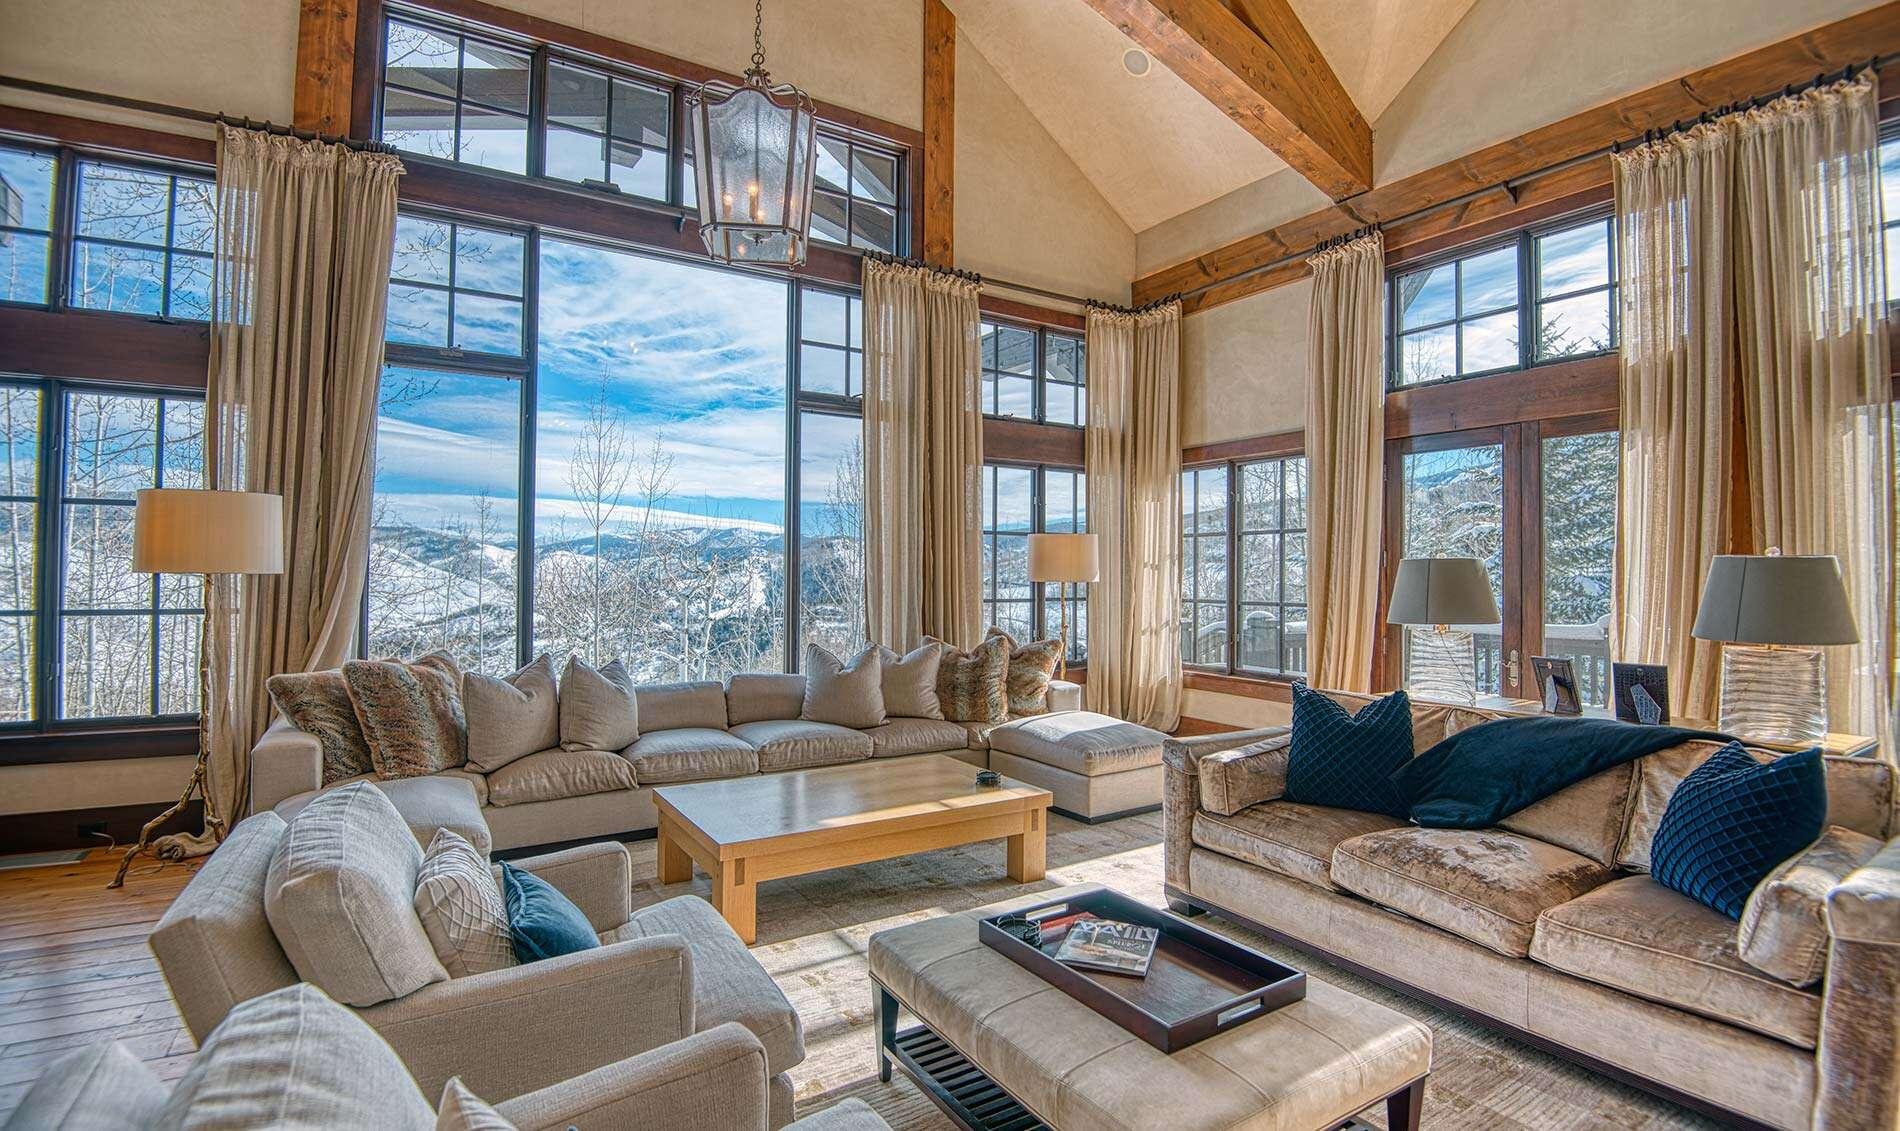 Luxury vacation rentals usa - Colorado - Avon - Bachelor gulch - 917 Bachelor Ridge - Image 1/43